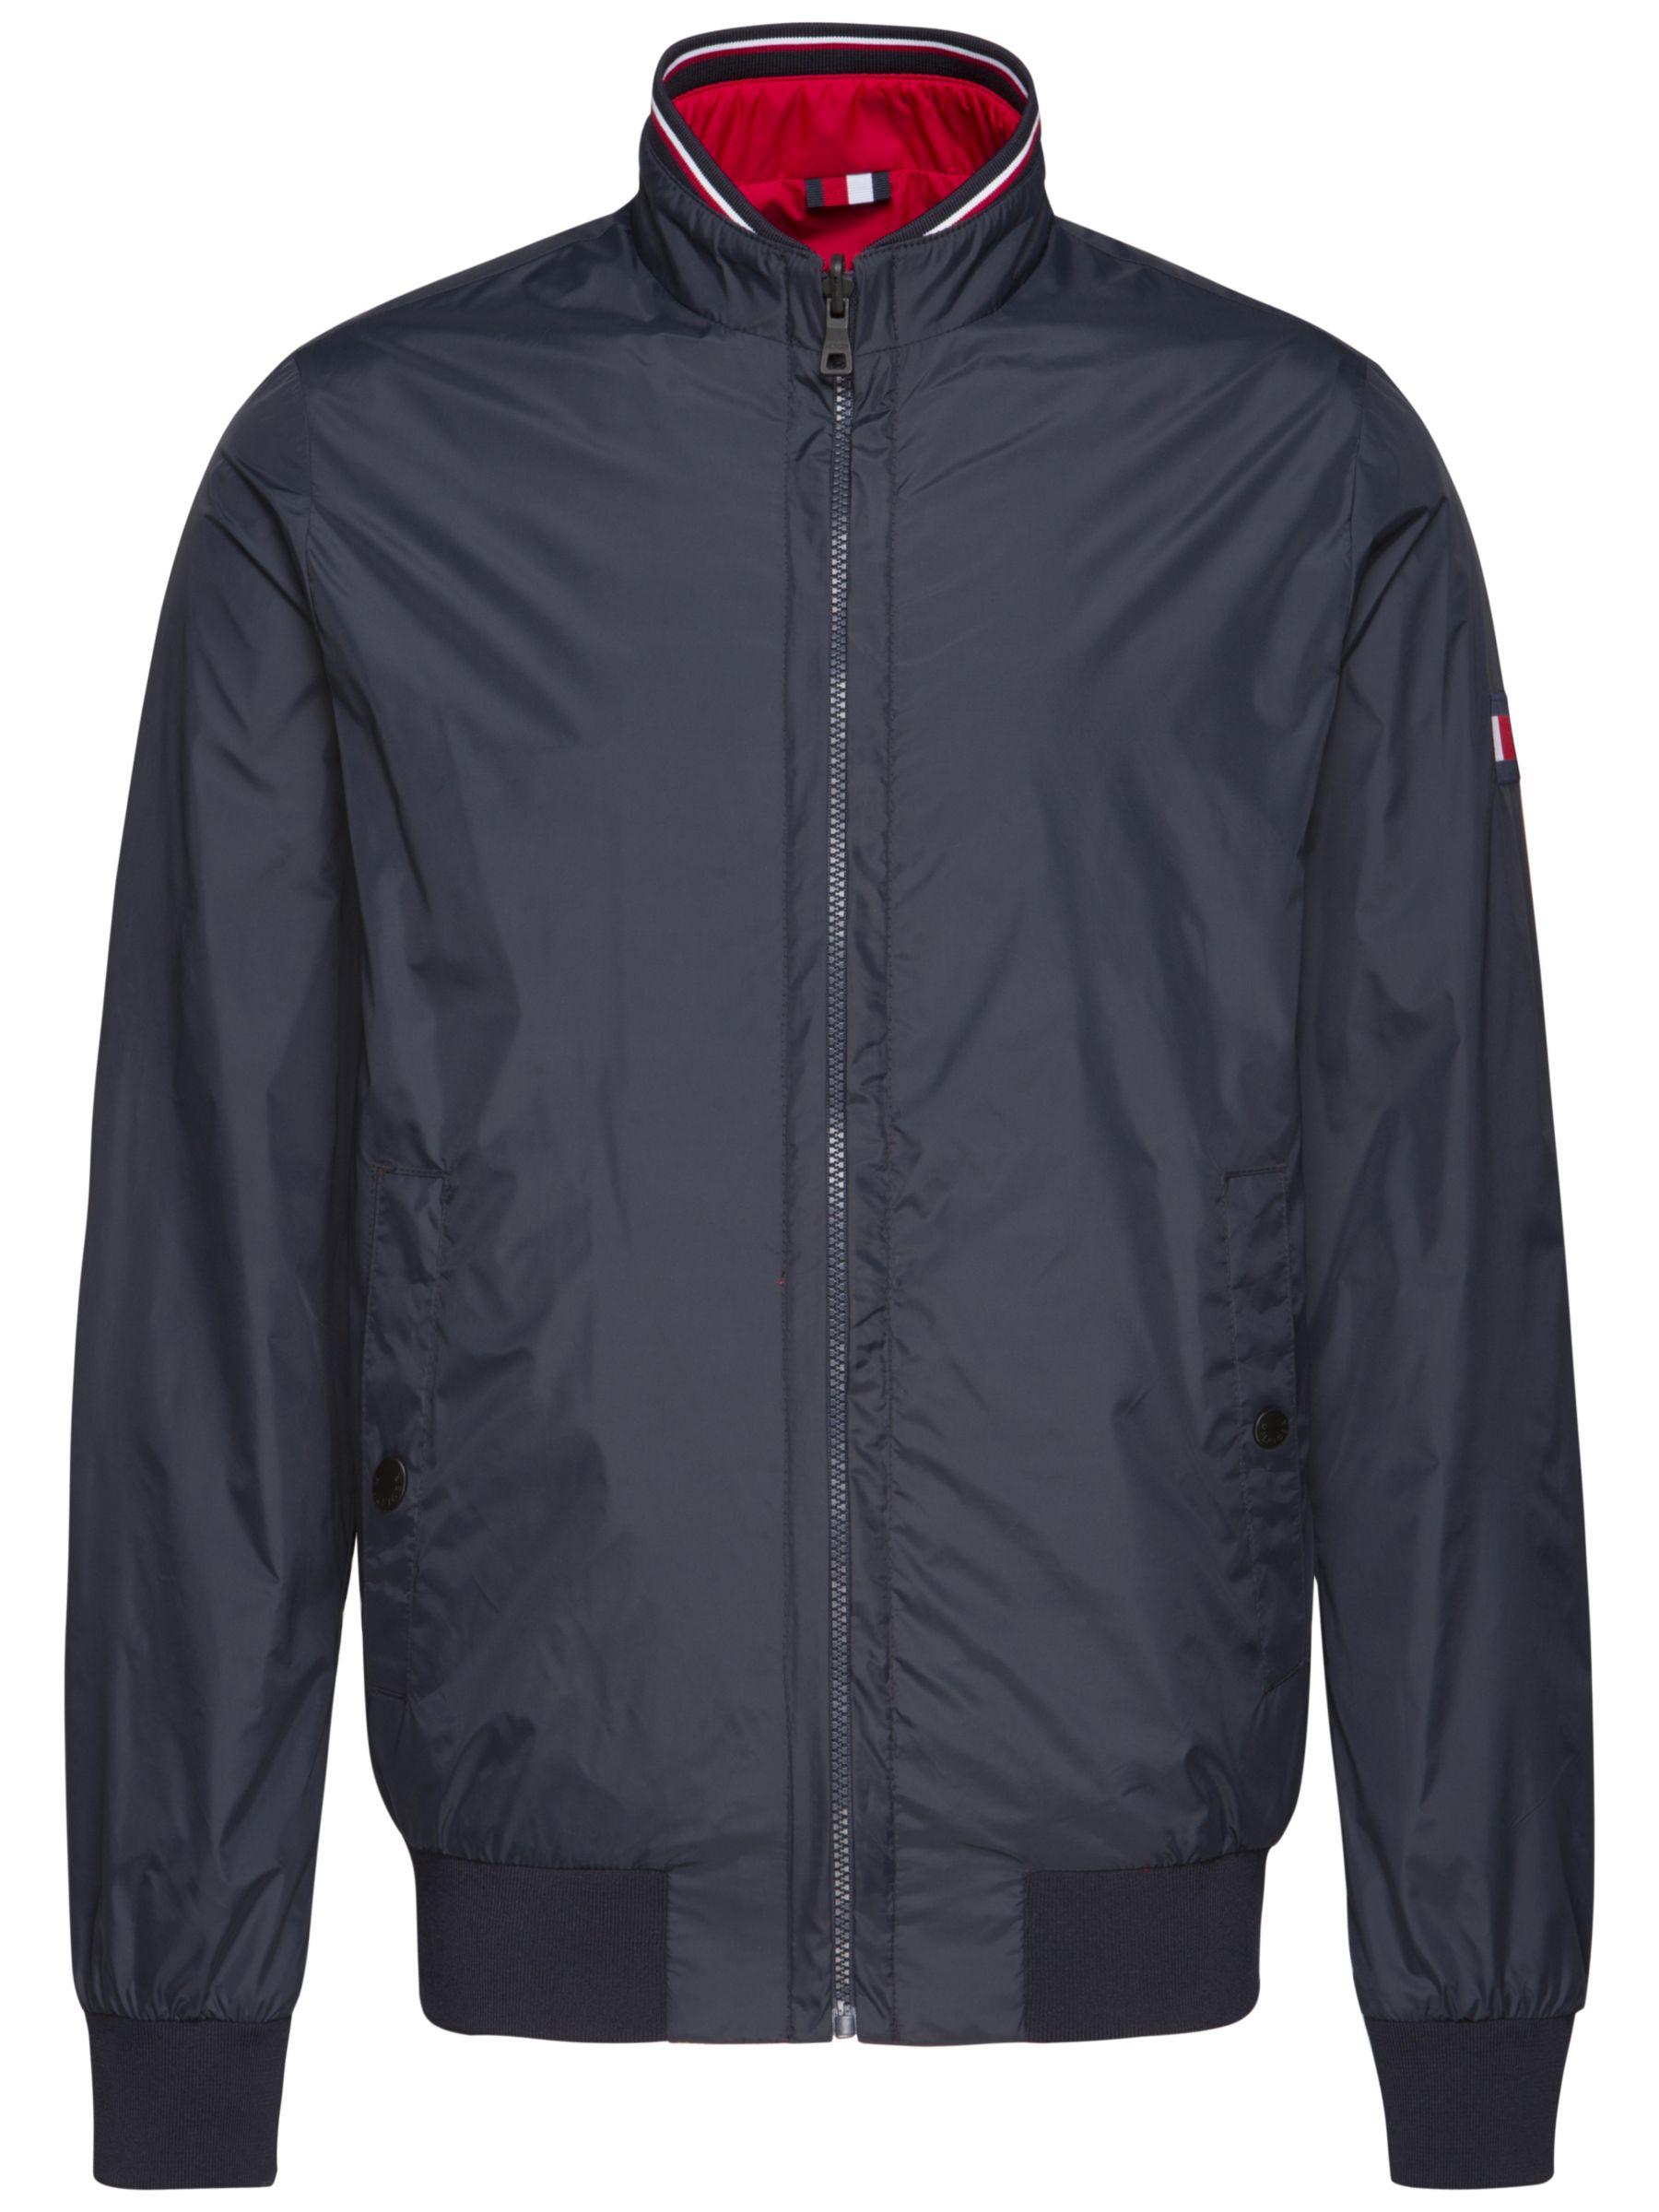 db5cf61c Tommy Hilfiger Reversible Bomber Jacket, Blue at John Lewis & Partners